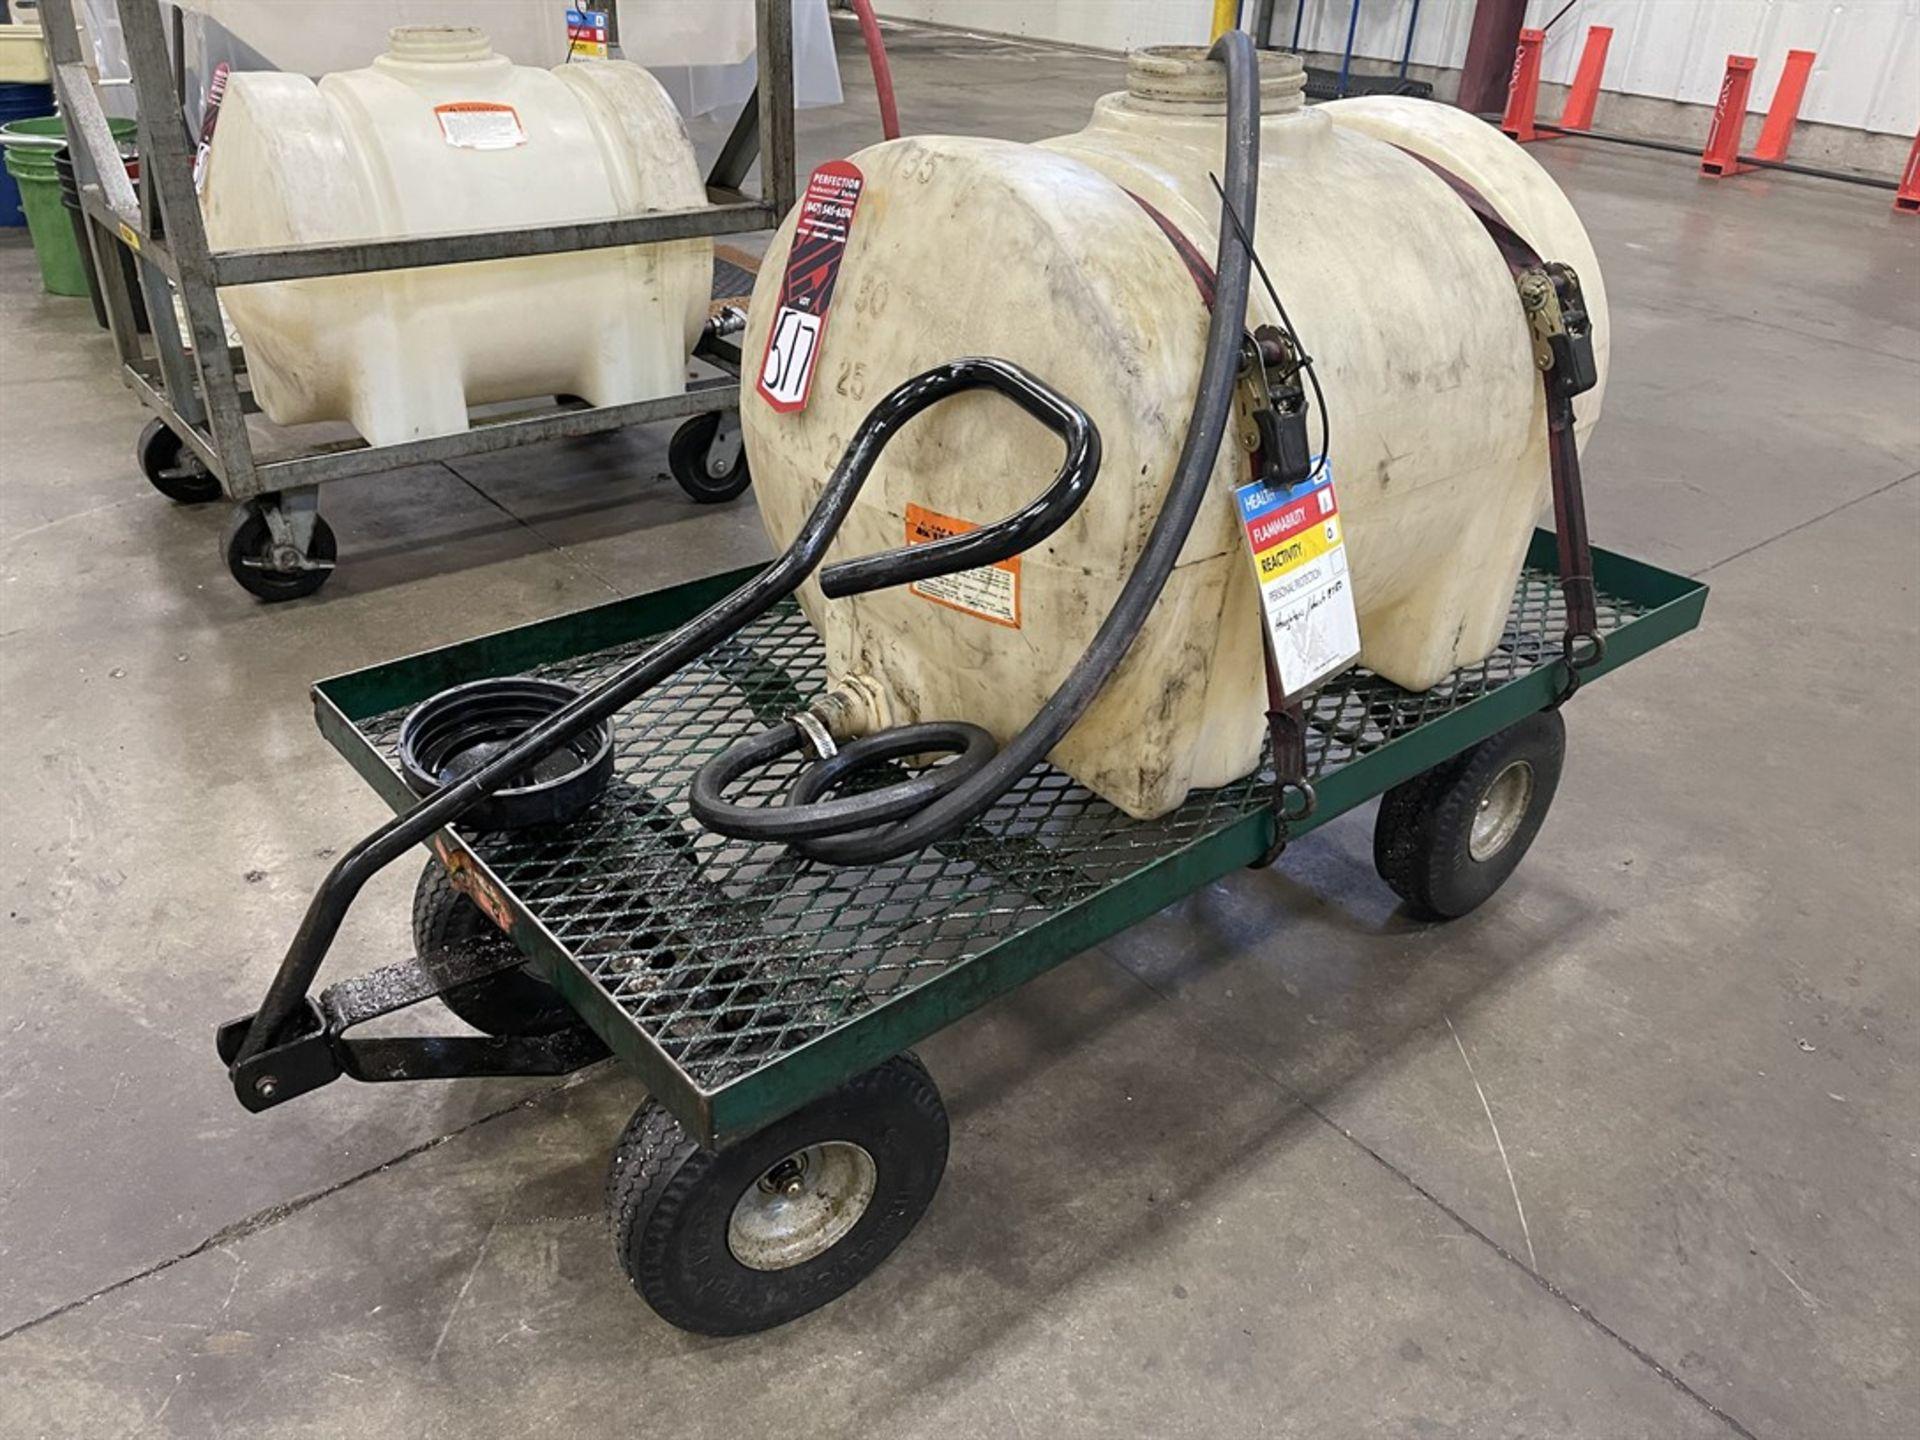 35 Gallon Tank On Rolling Wagon